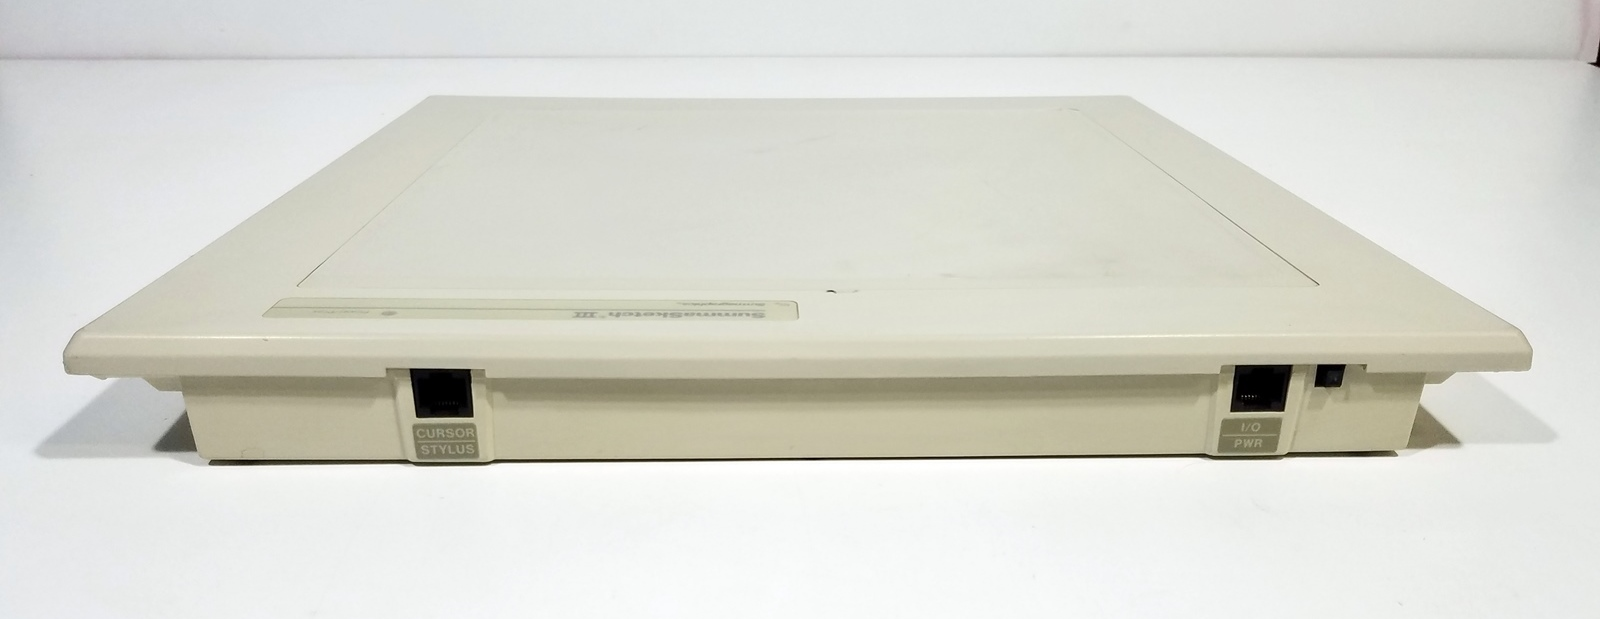 Lot 61 - SUMMAGRAPHICS DIGITAL GRAPHOC TABLET